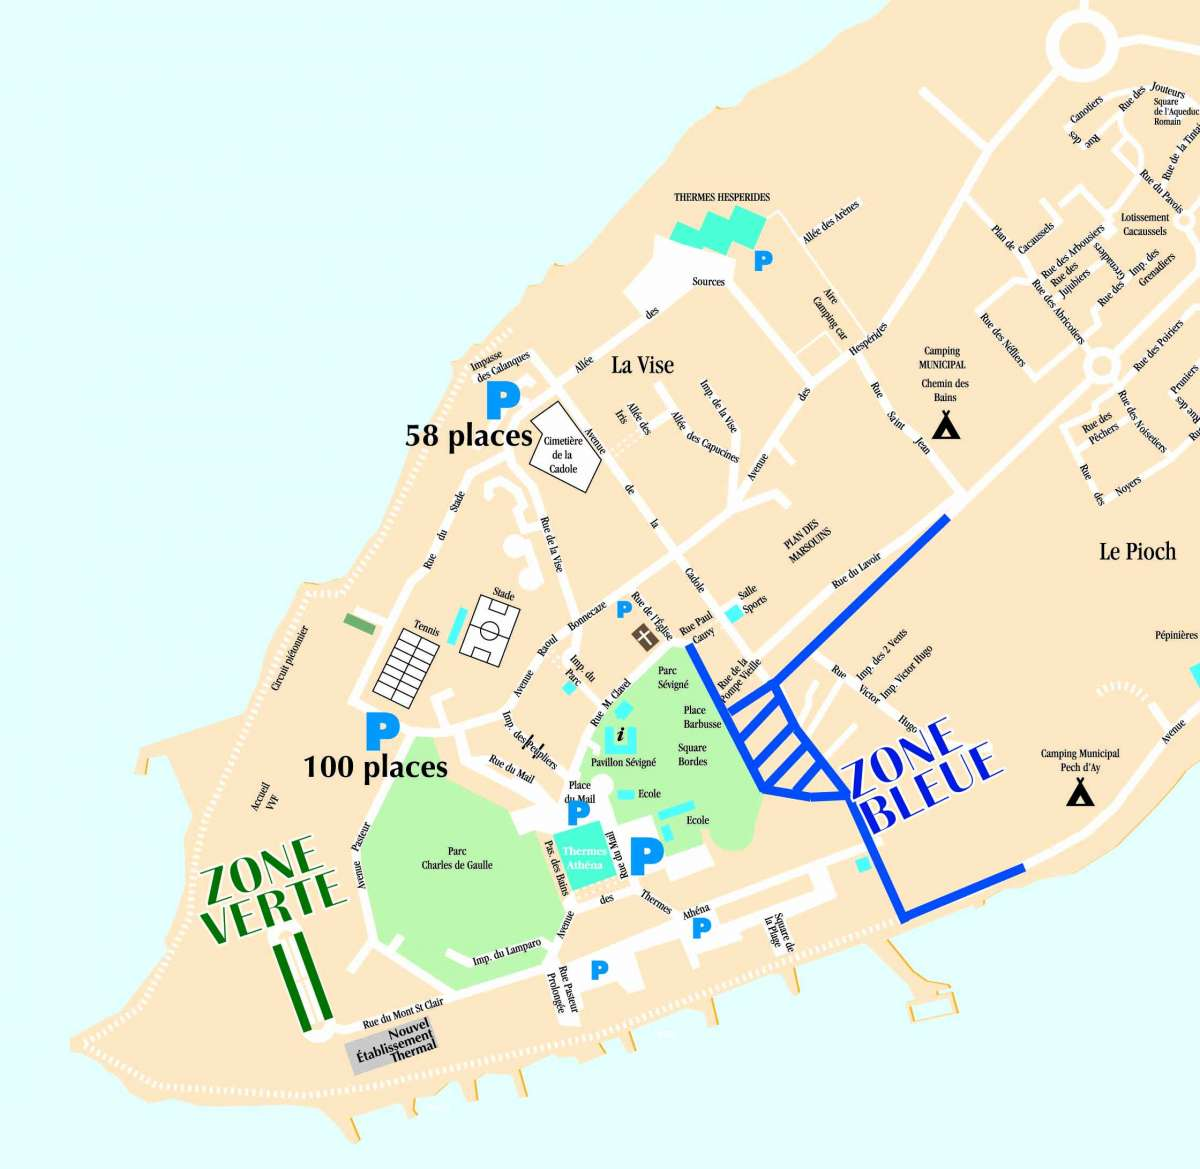 Zone de stationnement r glement es for Zone plan